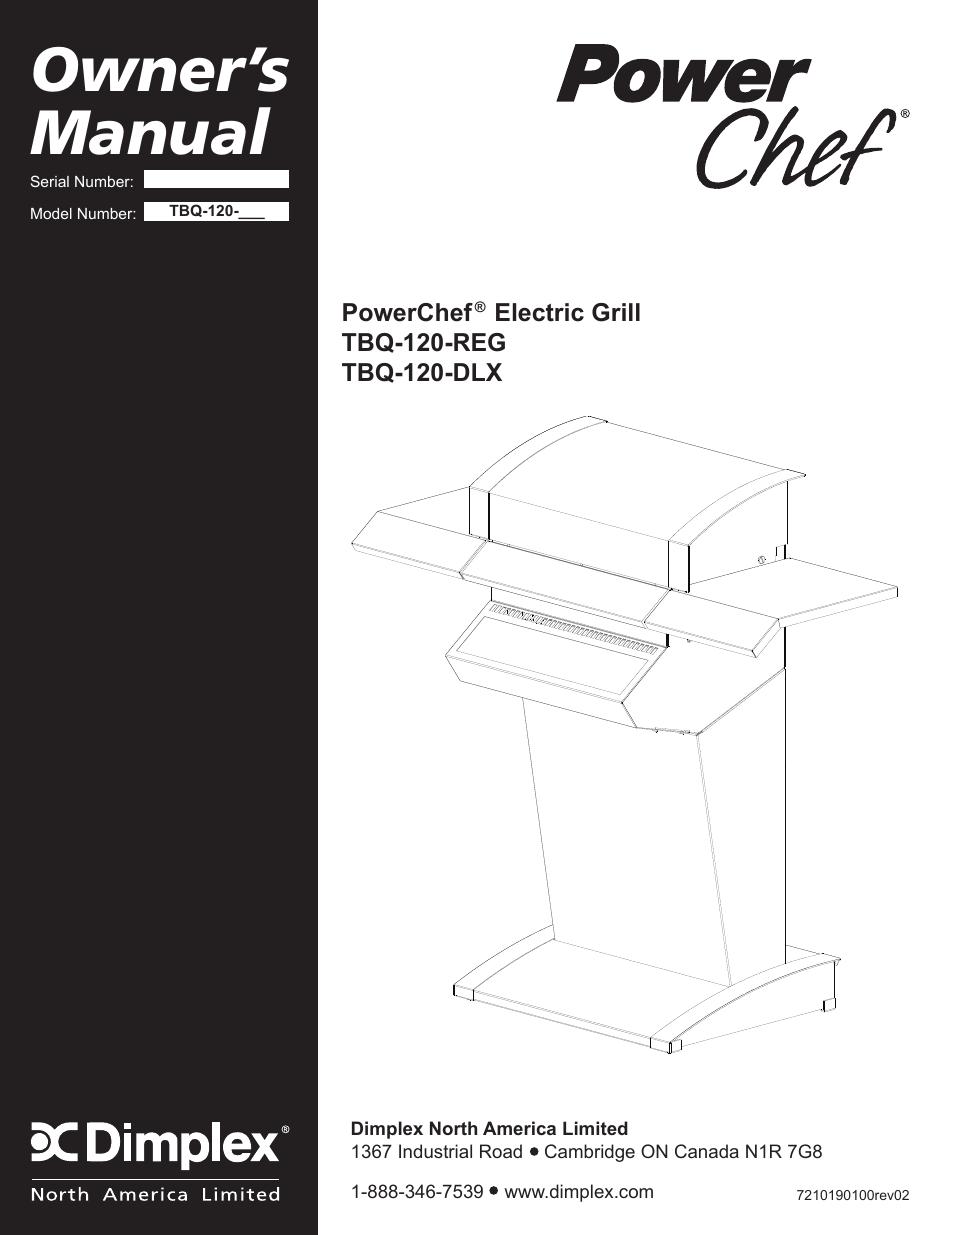 dimplex powerchef electric grill tbq 120 reg user manual 29